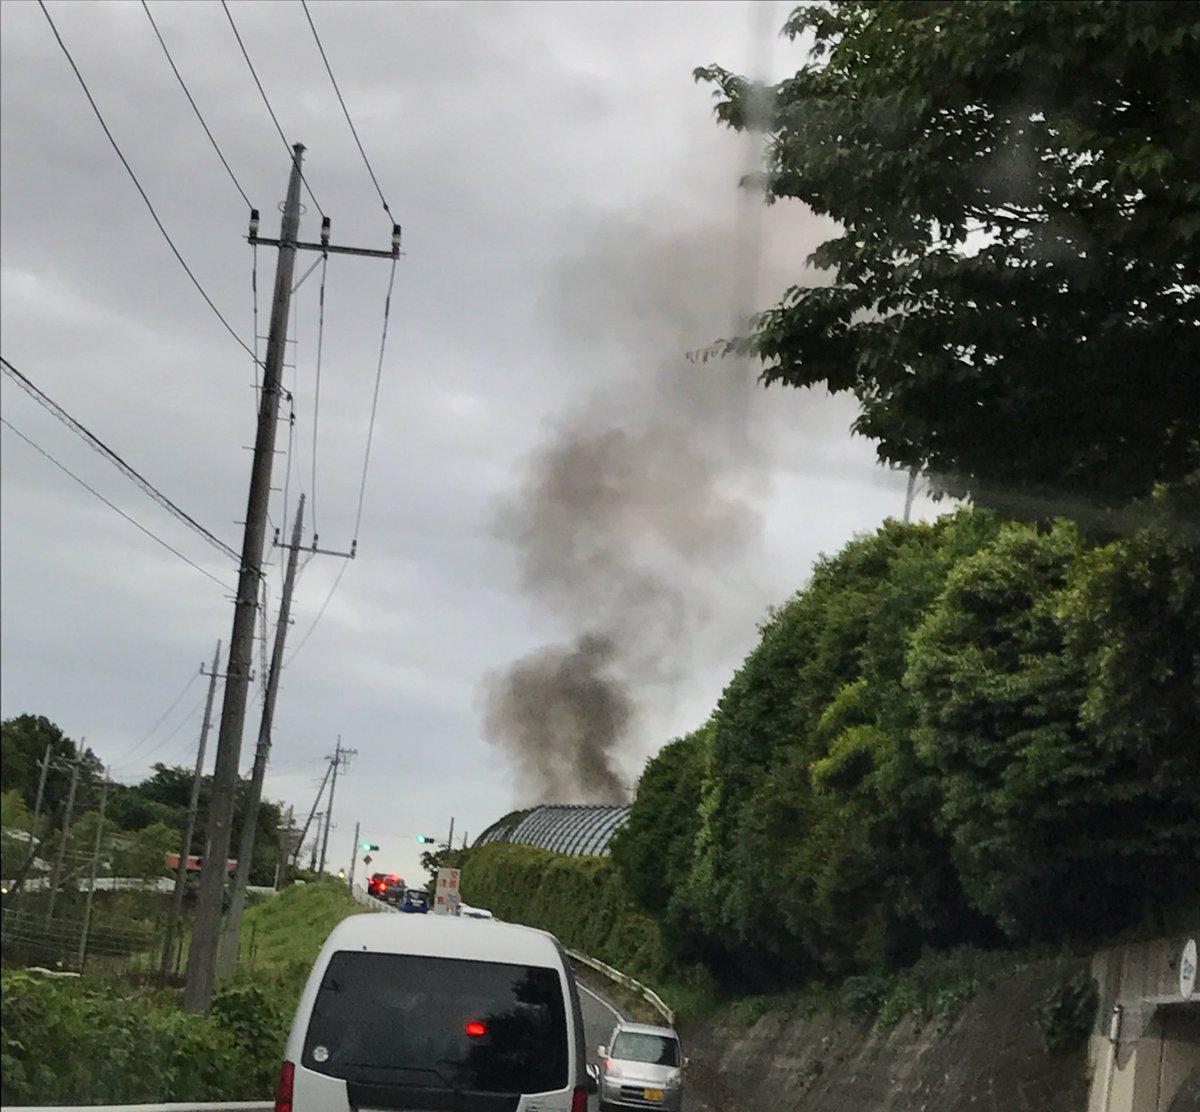 test ツイッターメディア - 東名高速でなんか燃えてる🔥😳 https://t.co/EQrhcA7wwc